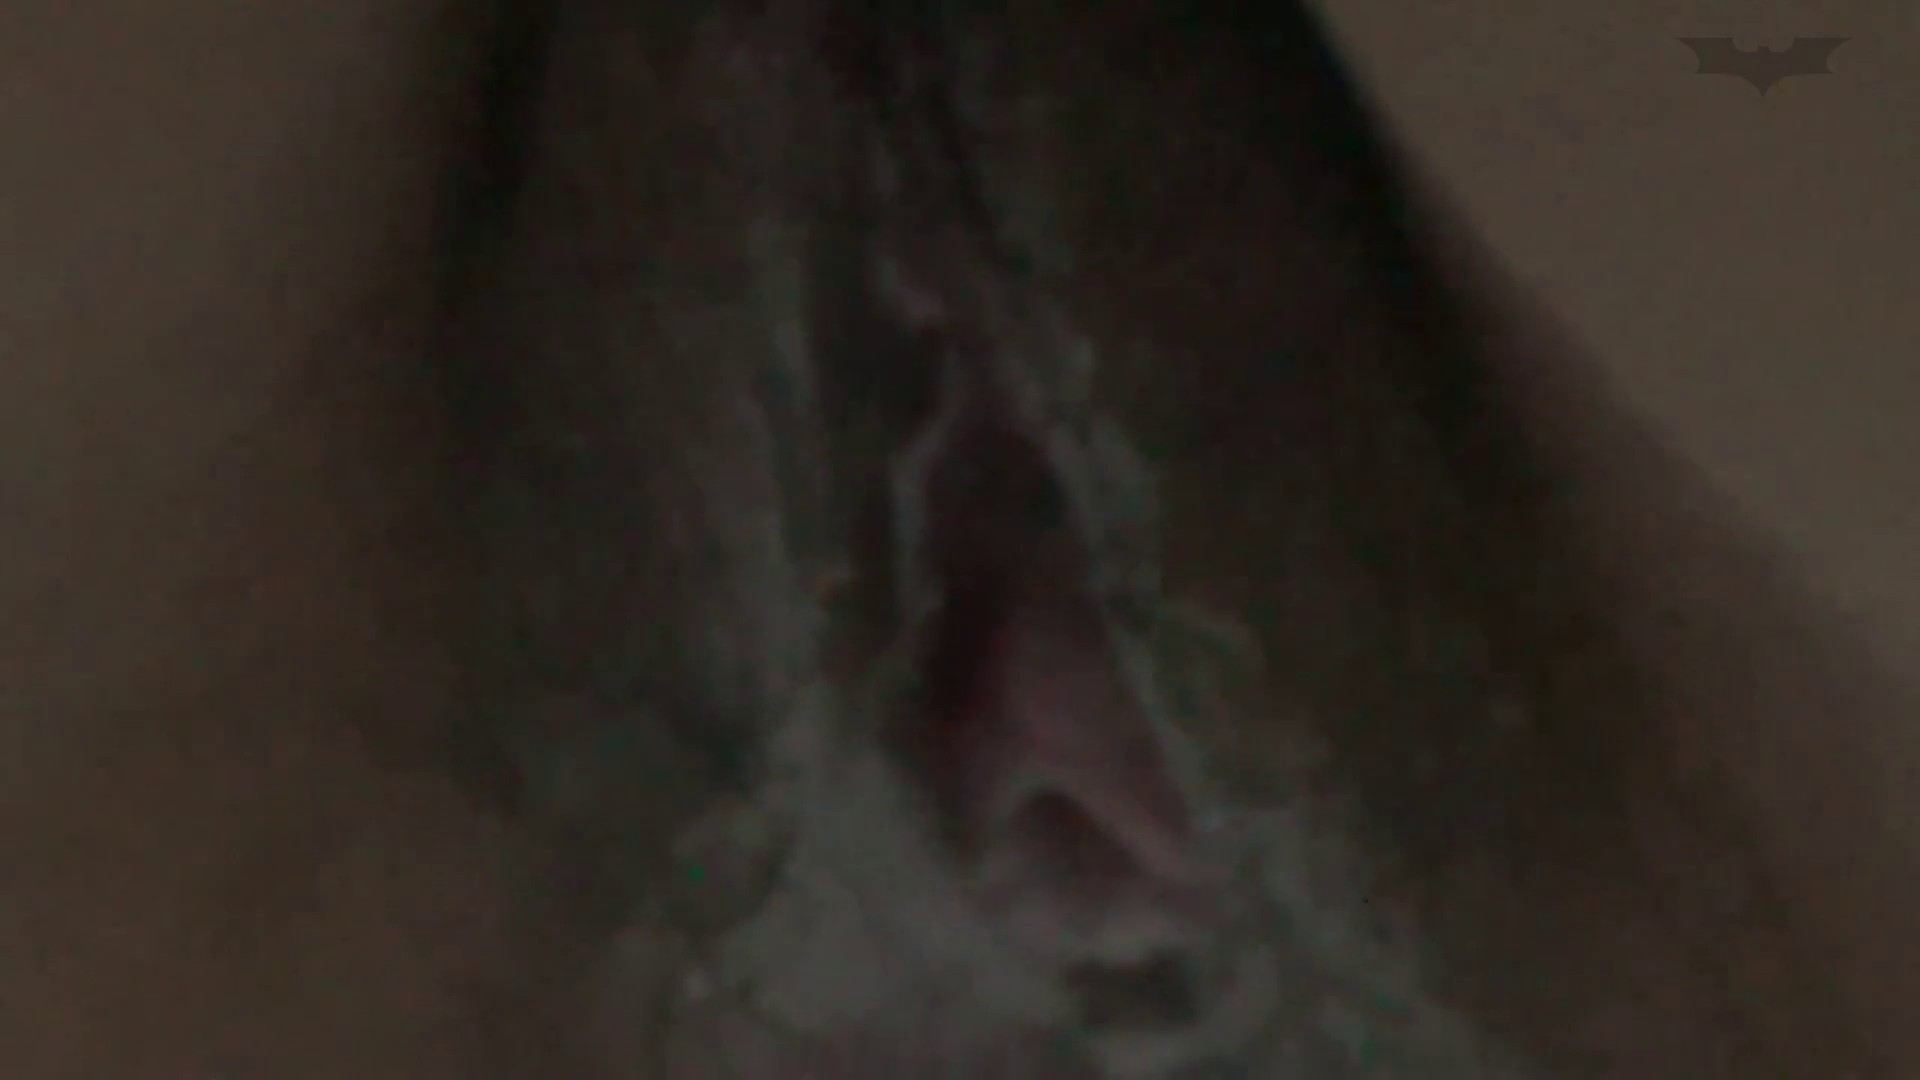 JD盗撮 美女の洗面所の秘密 Vol.44 丸見え アダルト動画キャプチャ 91枚 75